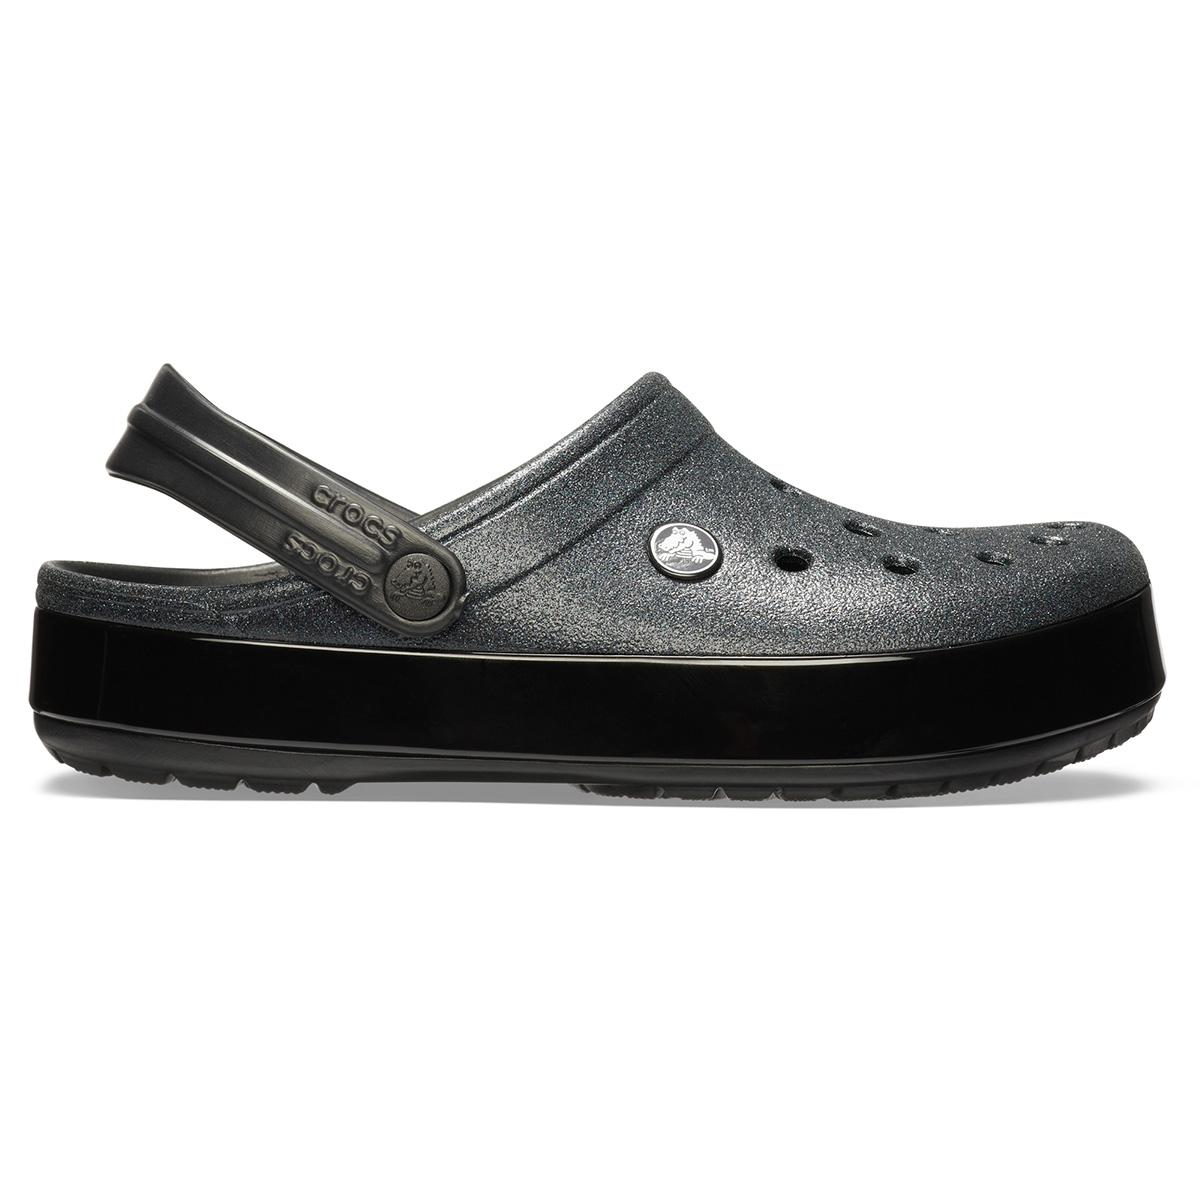 Crocs Crocband Glitter Clog - Siyah